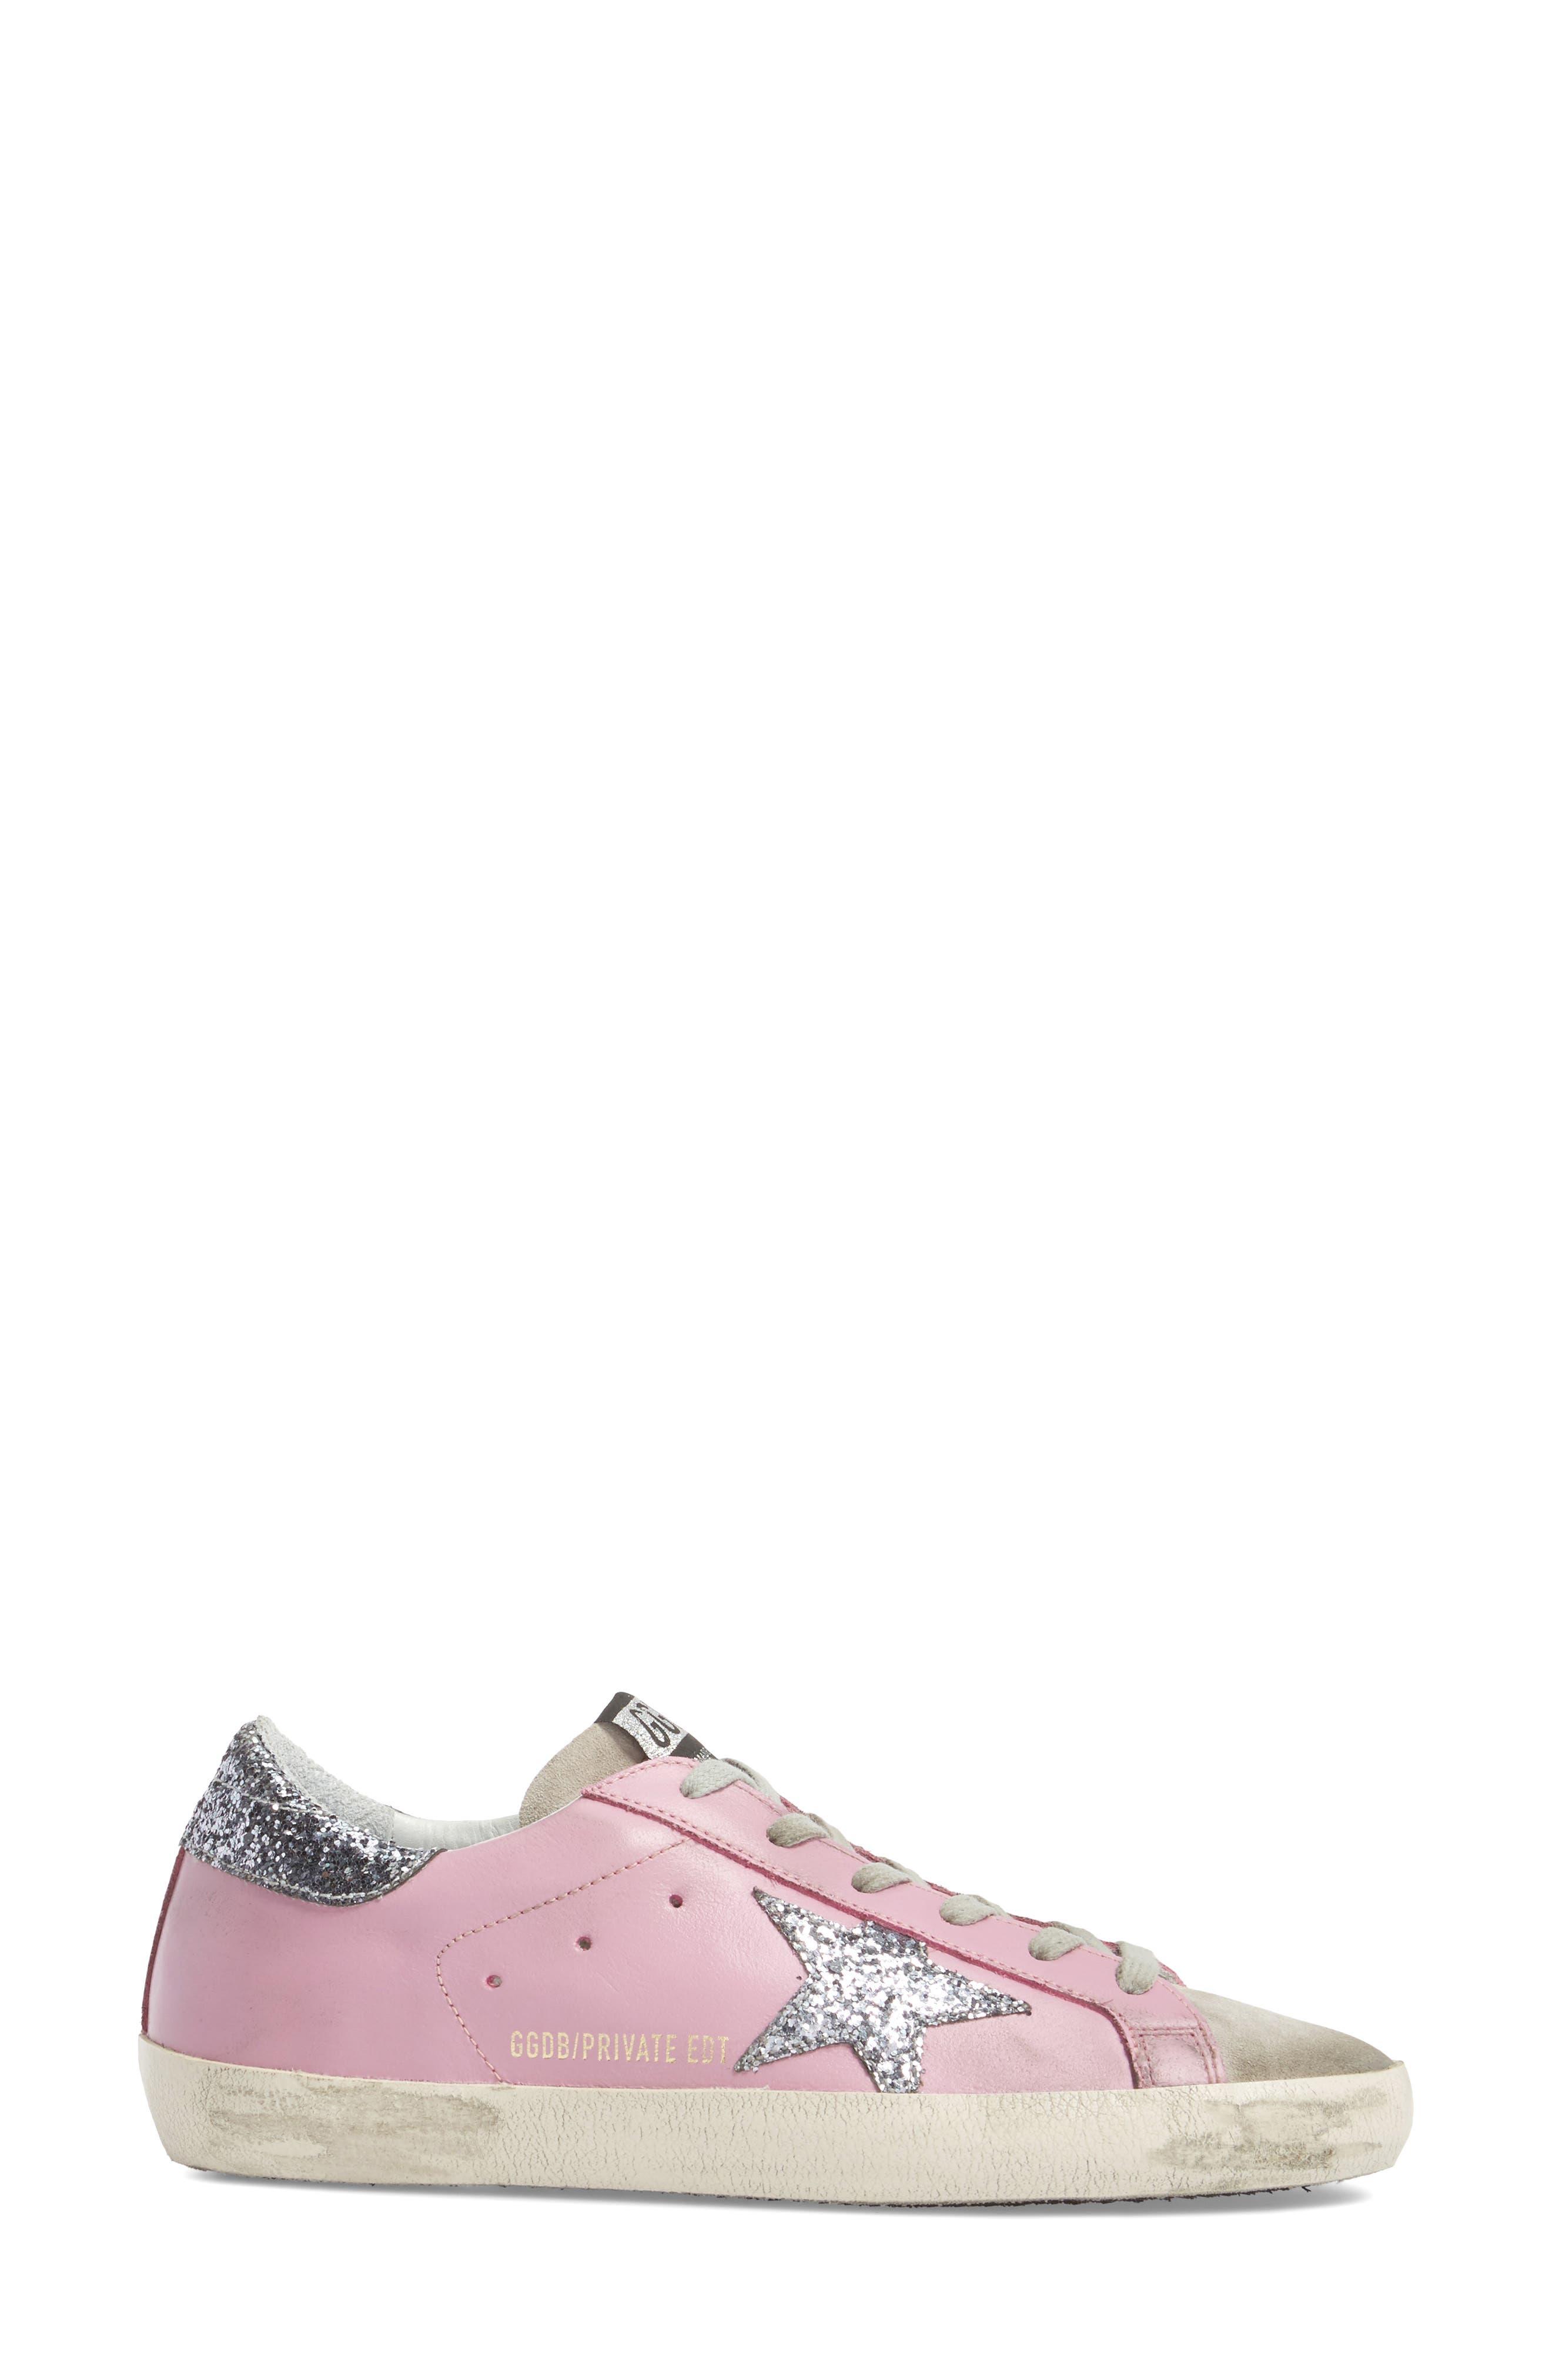 Superstar Low Top Sneaker,                             Alternate thumbnail 3, color,                             Pink/ Grey